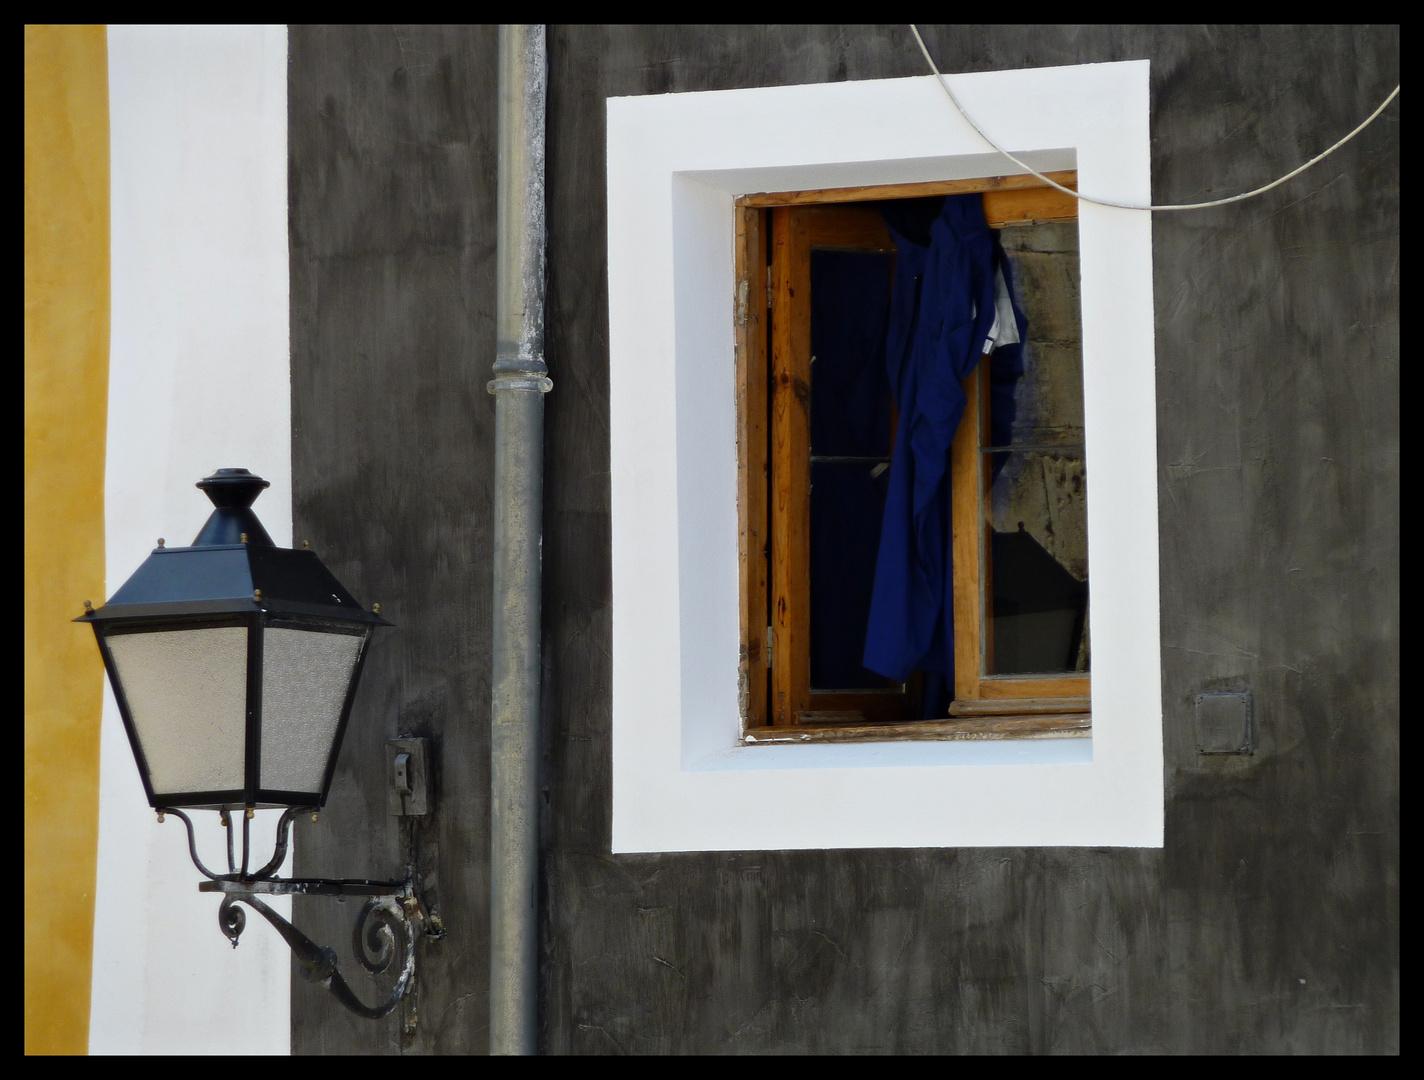 CUENCA - ventana